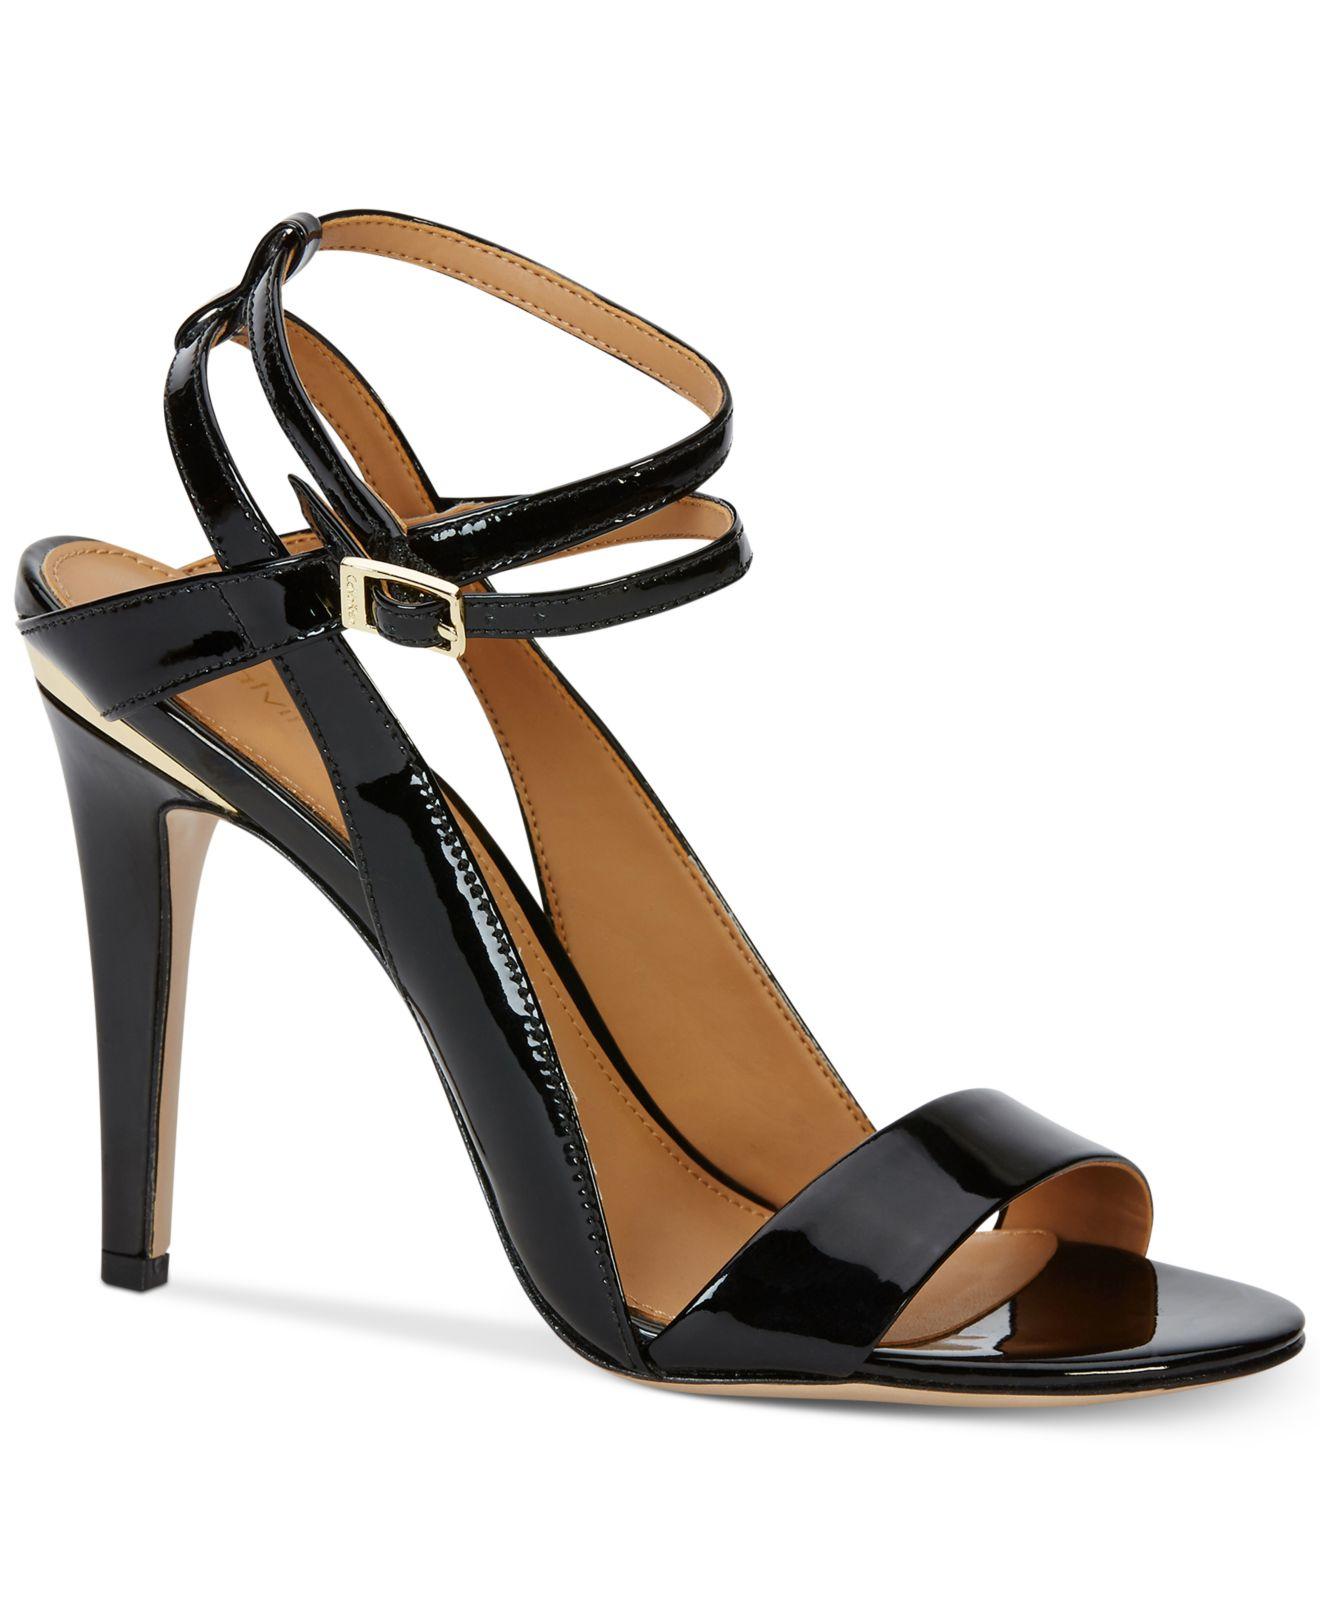 e6690b3b60ae Lyst - Calvin Klein Women s Melville Ankle-strap Sandals in Black